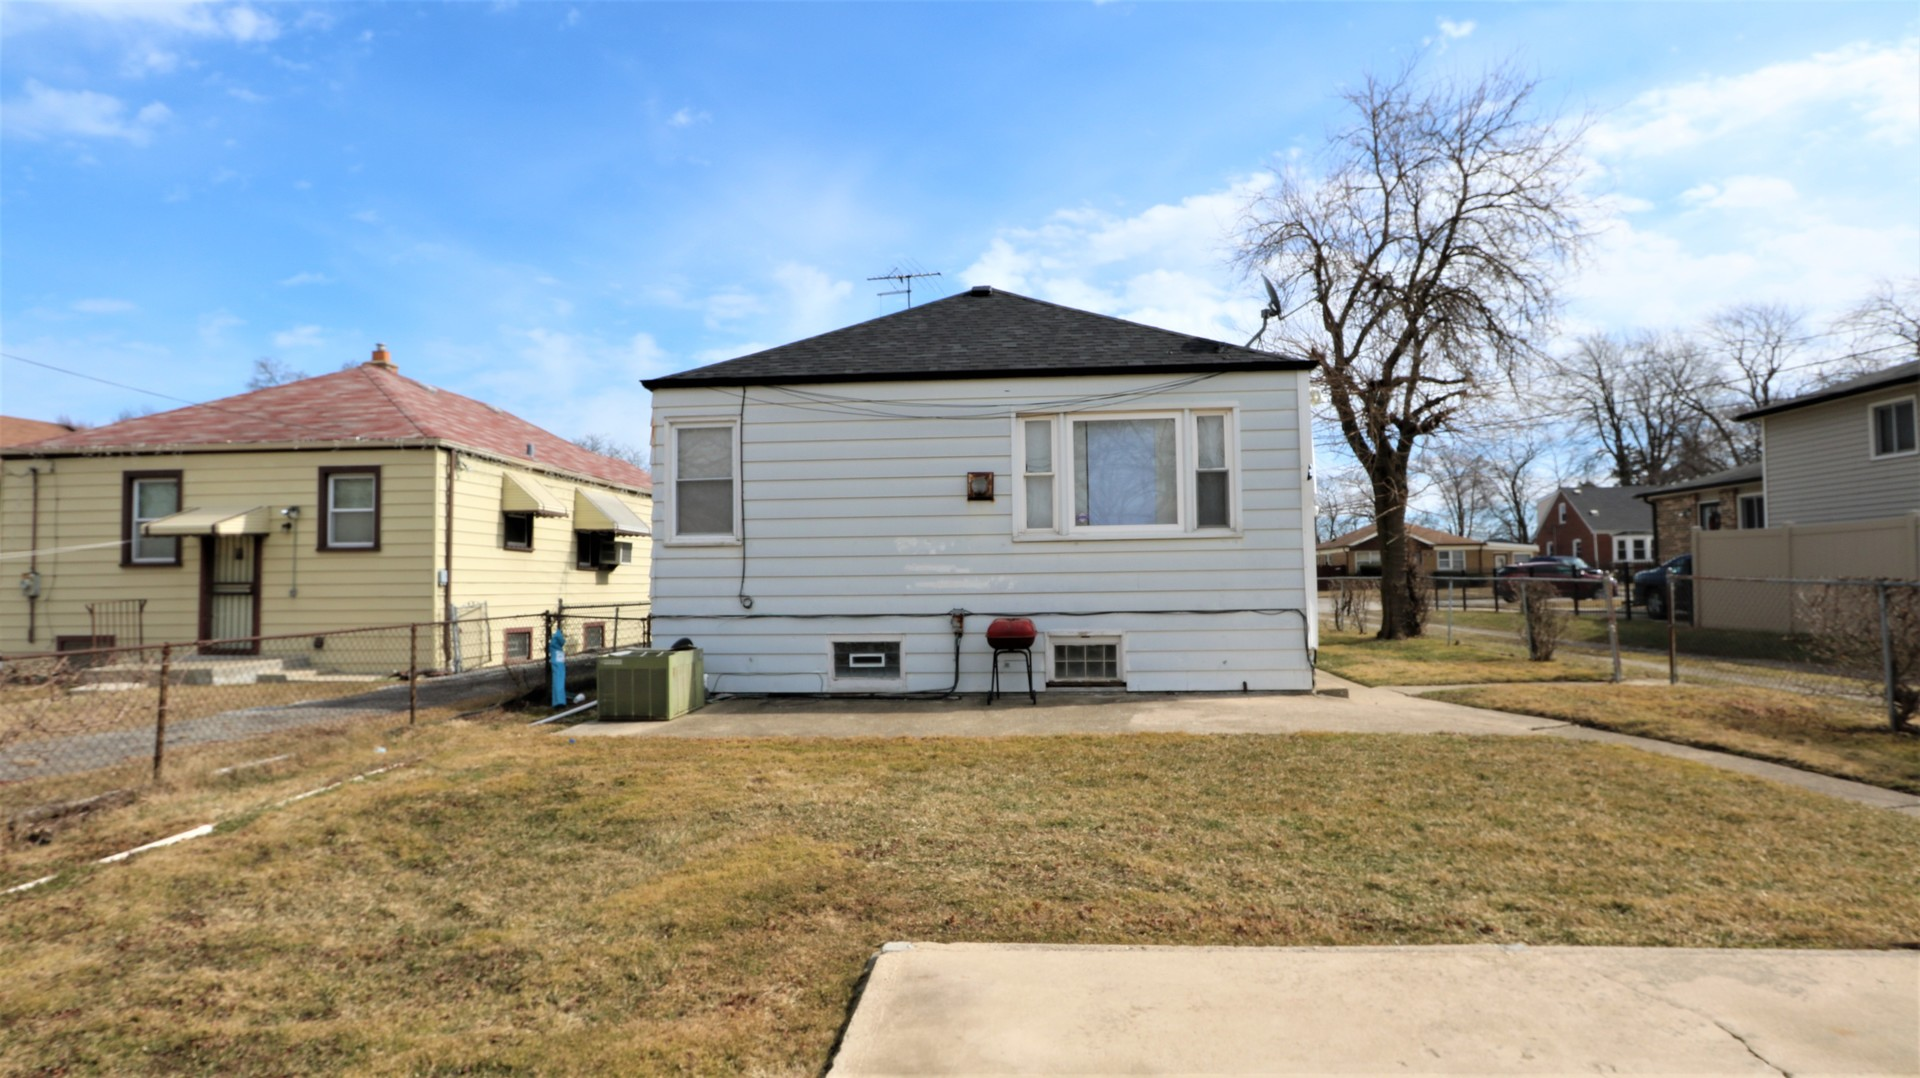 12832 South Throop, Calumet Park, Illinois, 60827